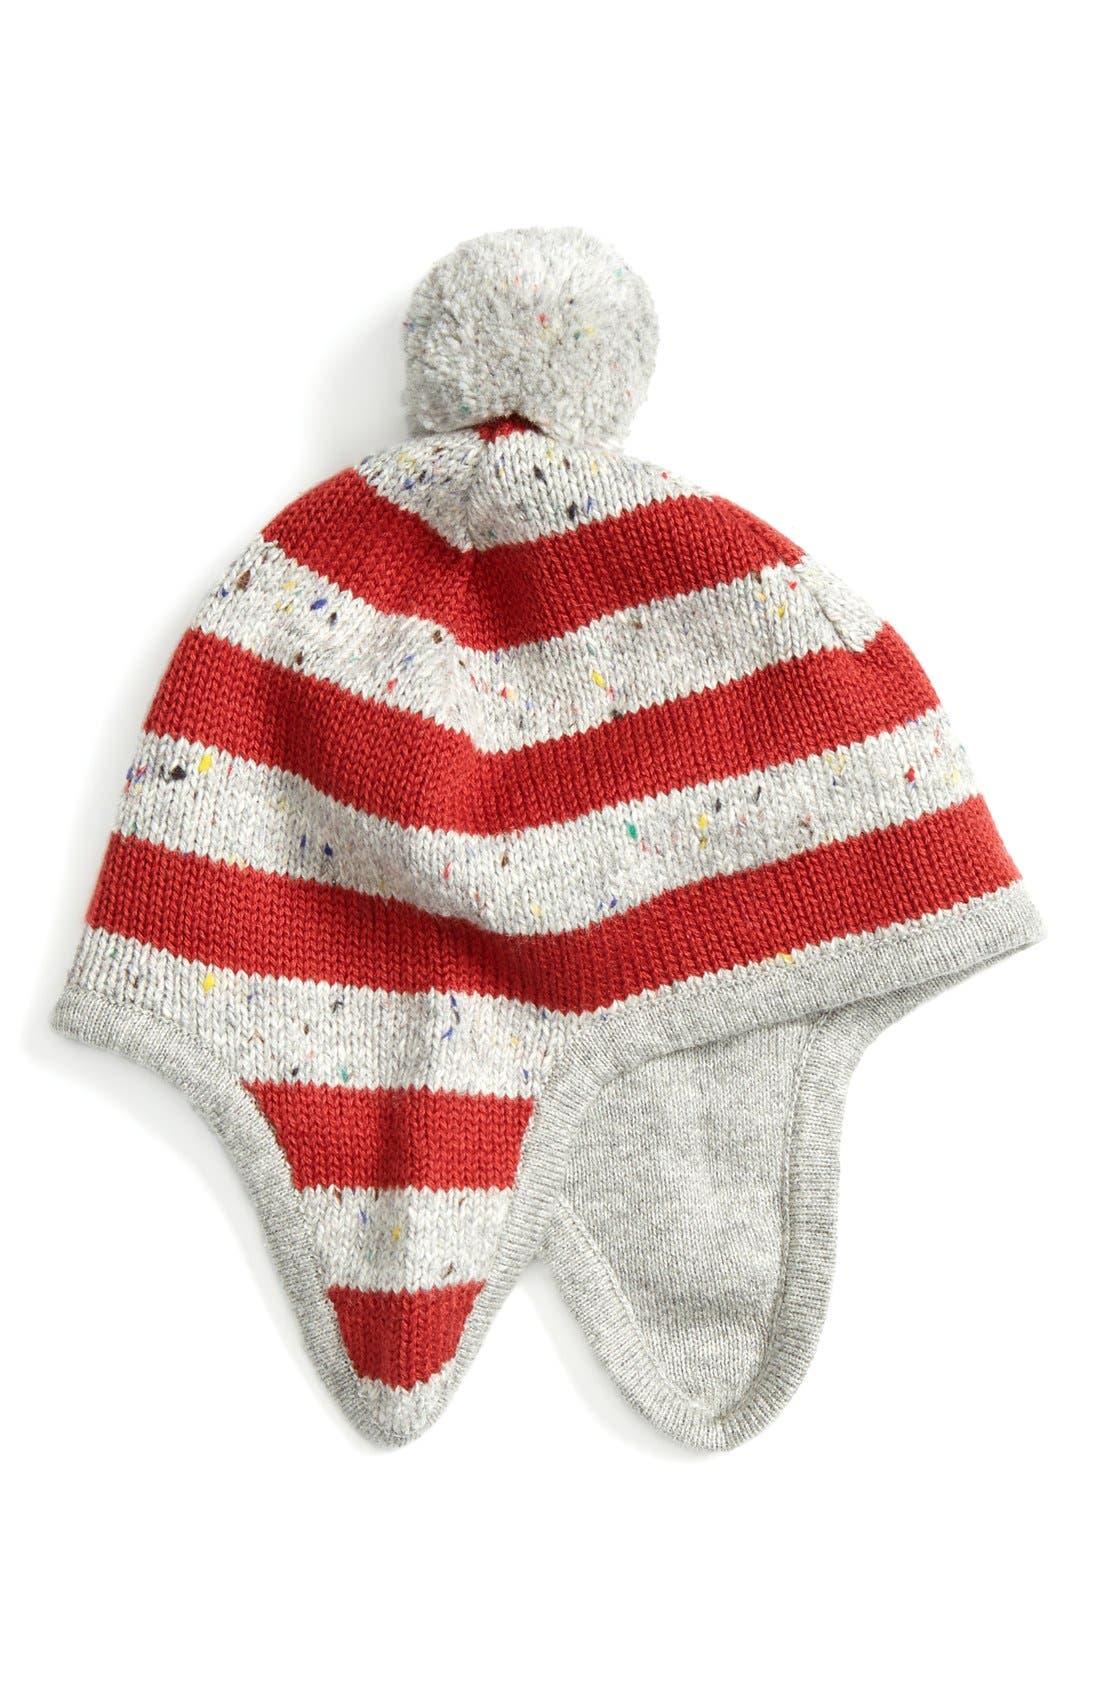 Stripe Earflap Hat,                             Main thumbnail 1, color,                             Grey Alloy- Red Stripe